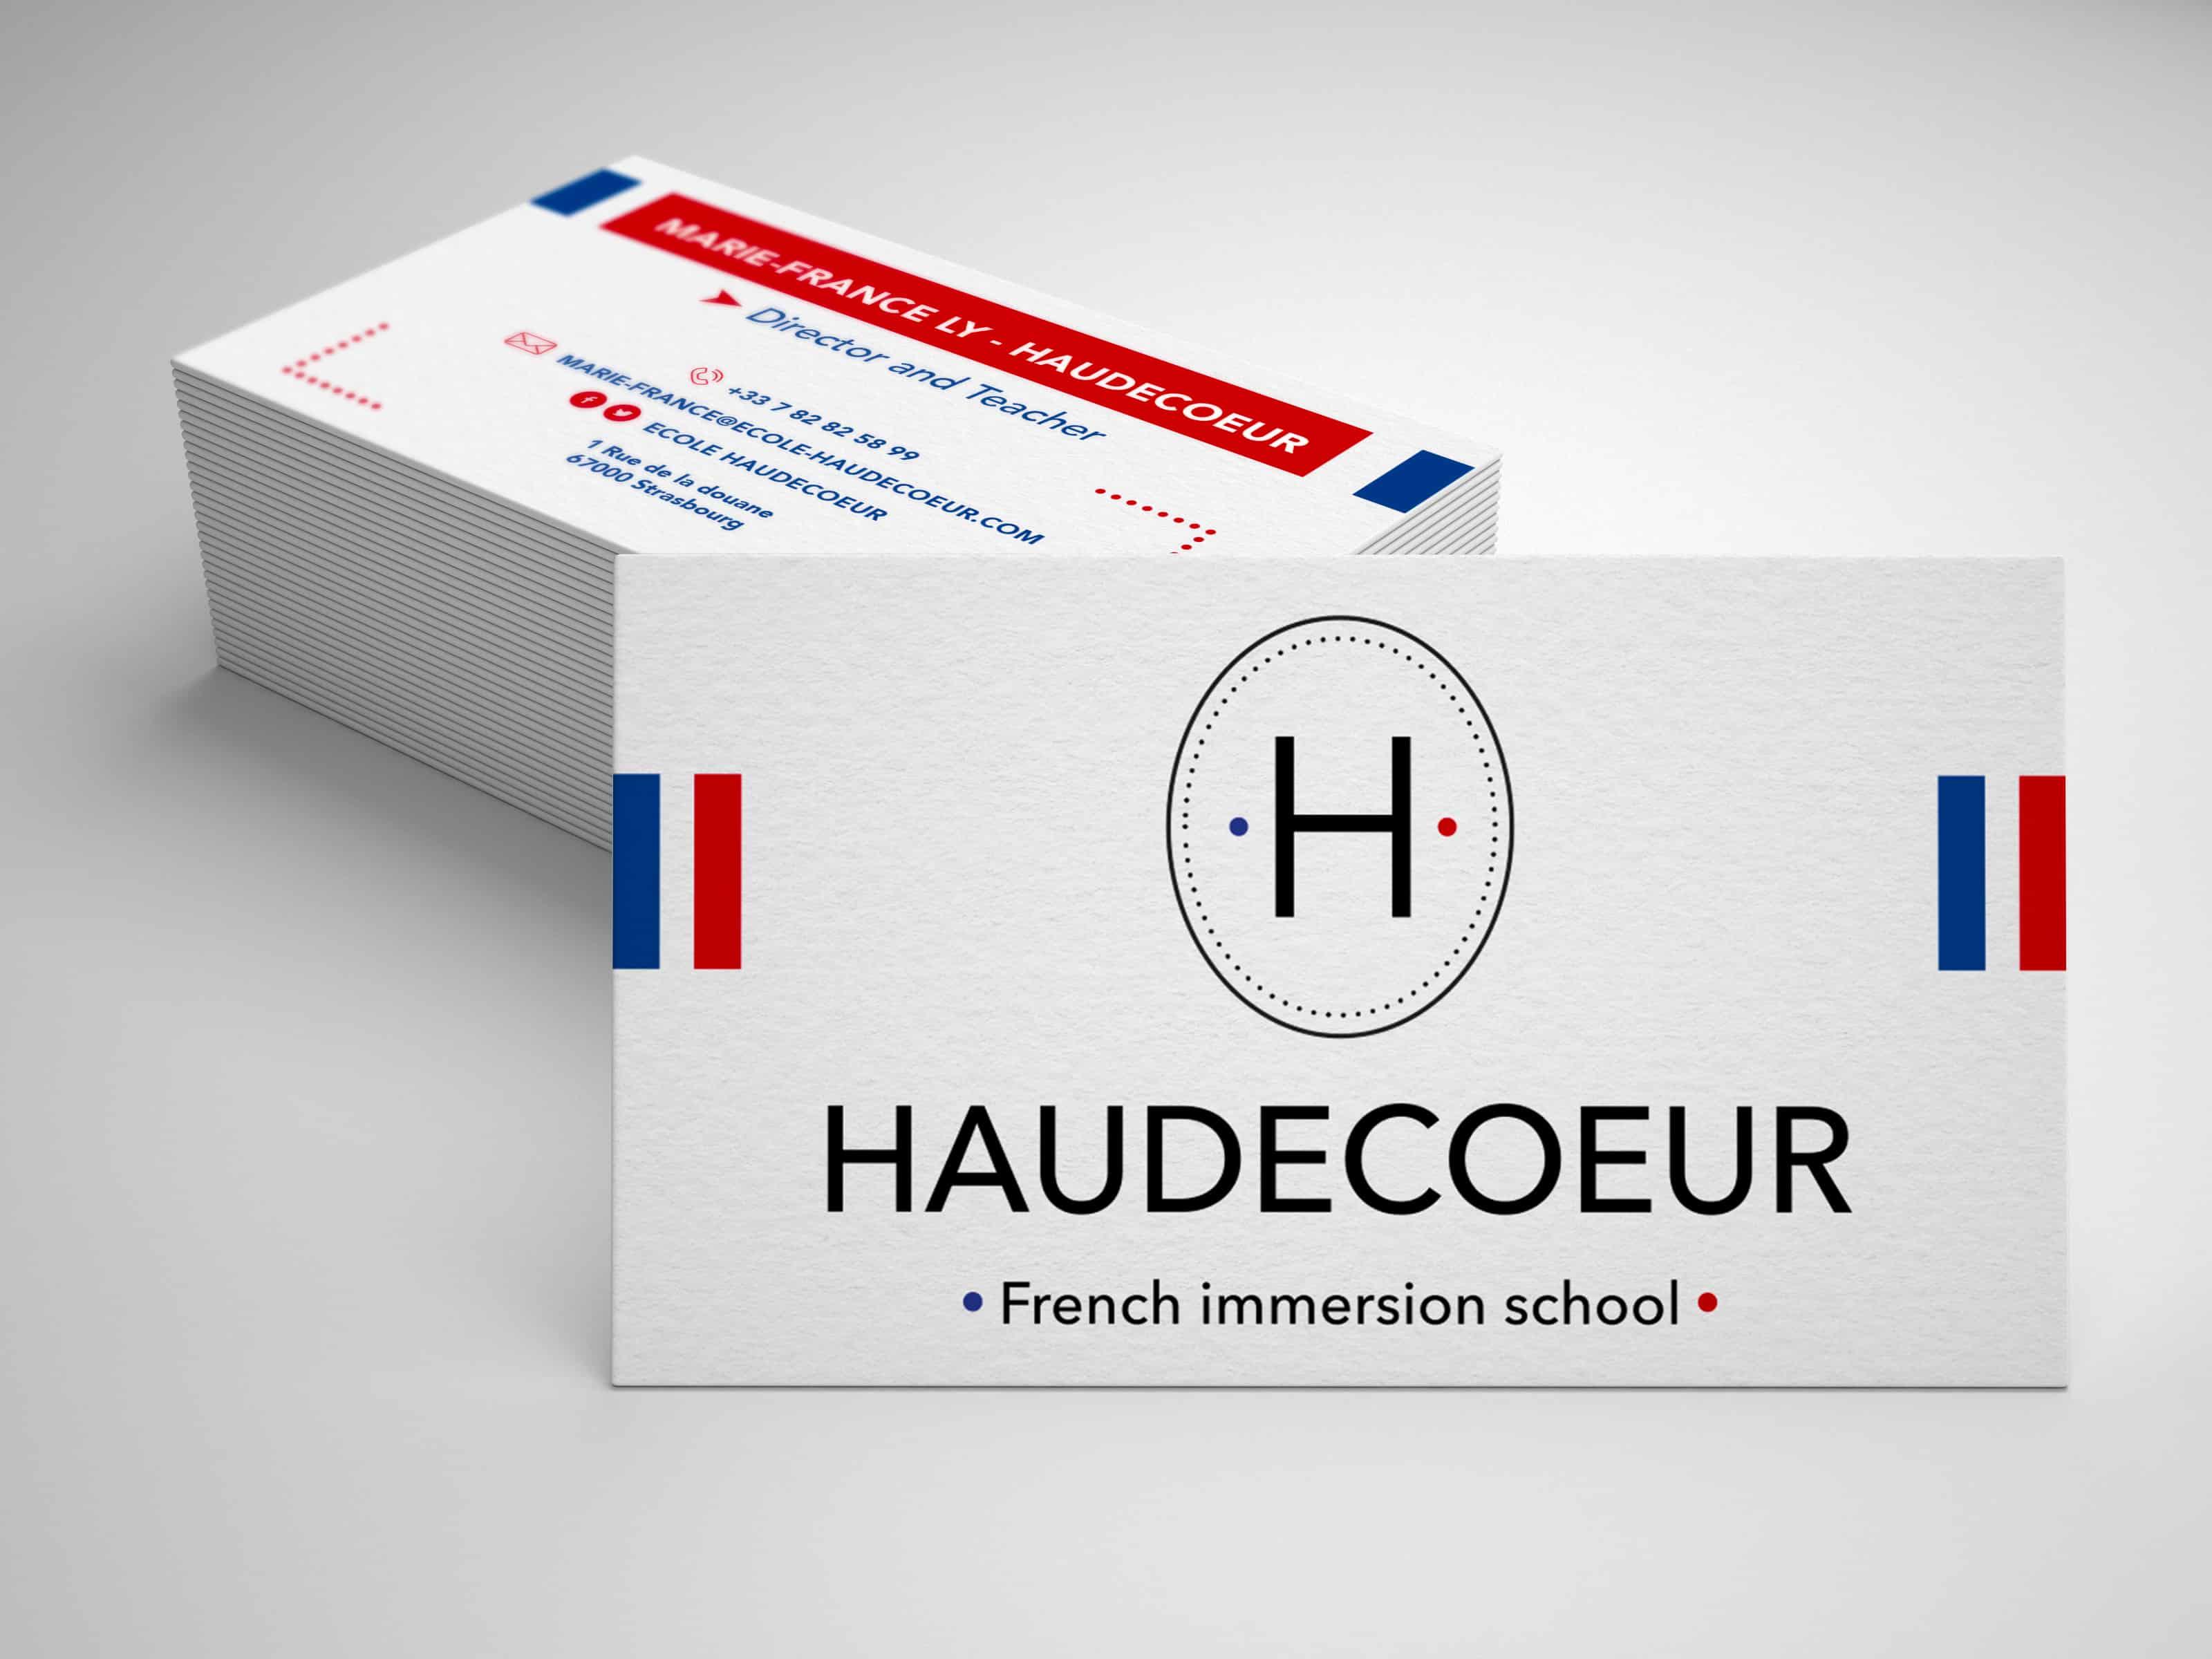 Ecole Haudecoeur